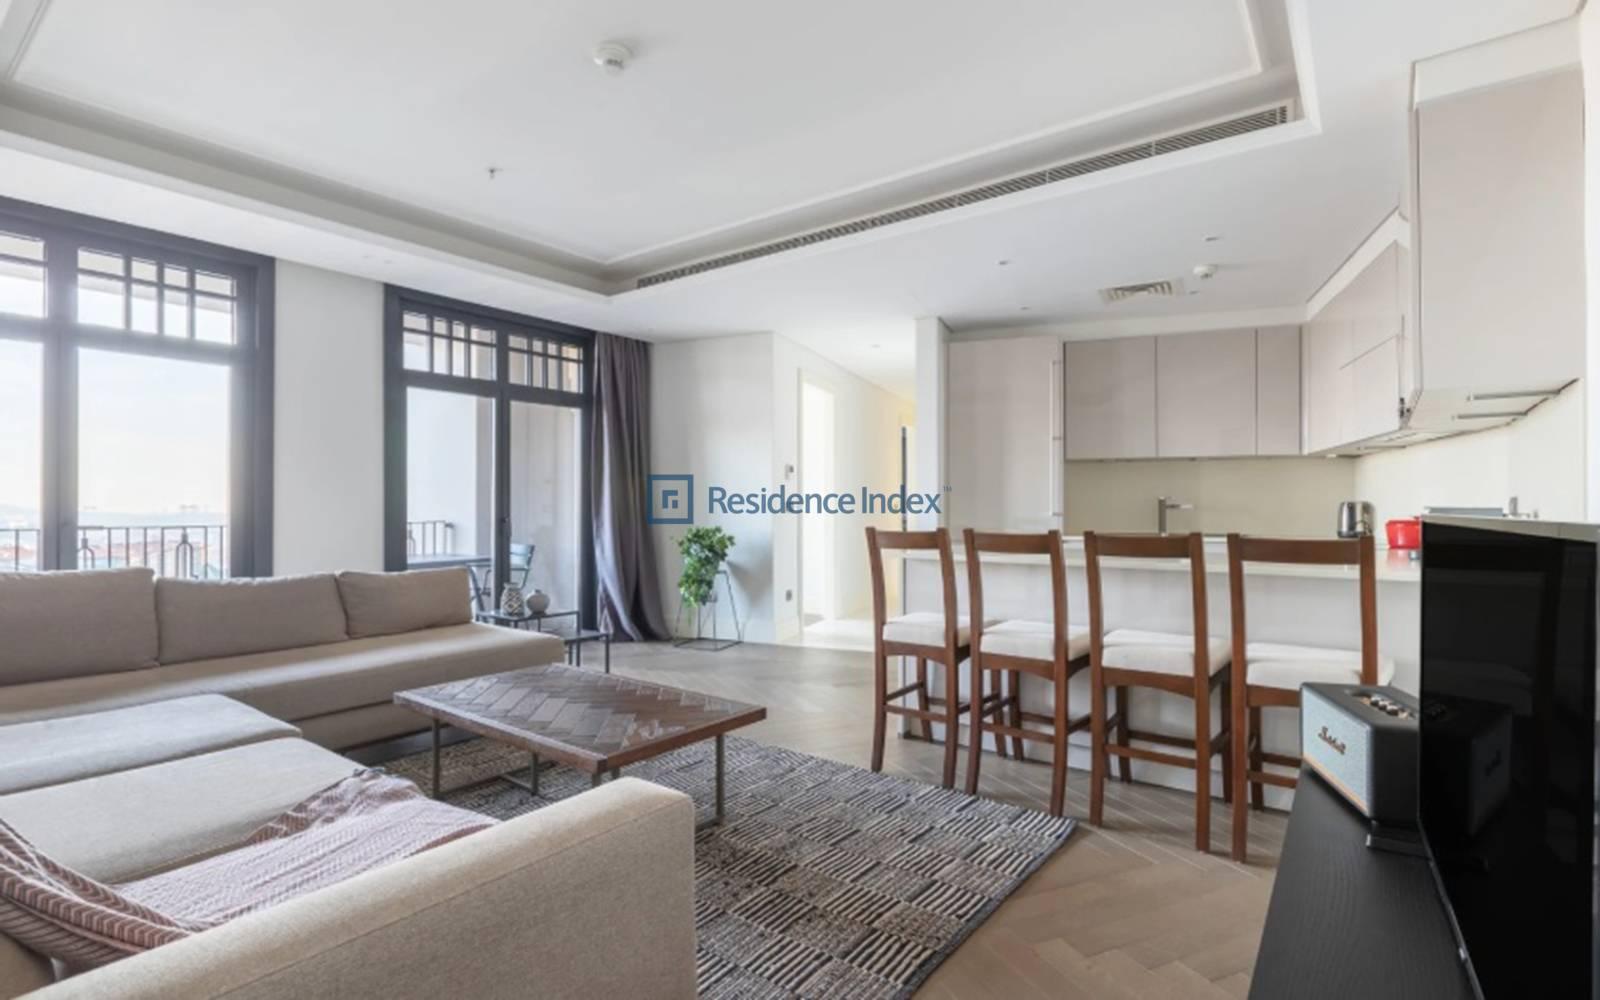 Nisbetiye On - 2+1 Furnished Apartment For Rent